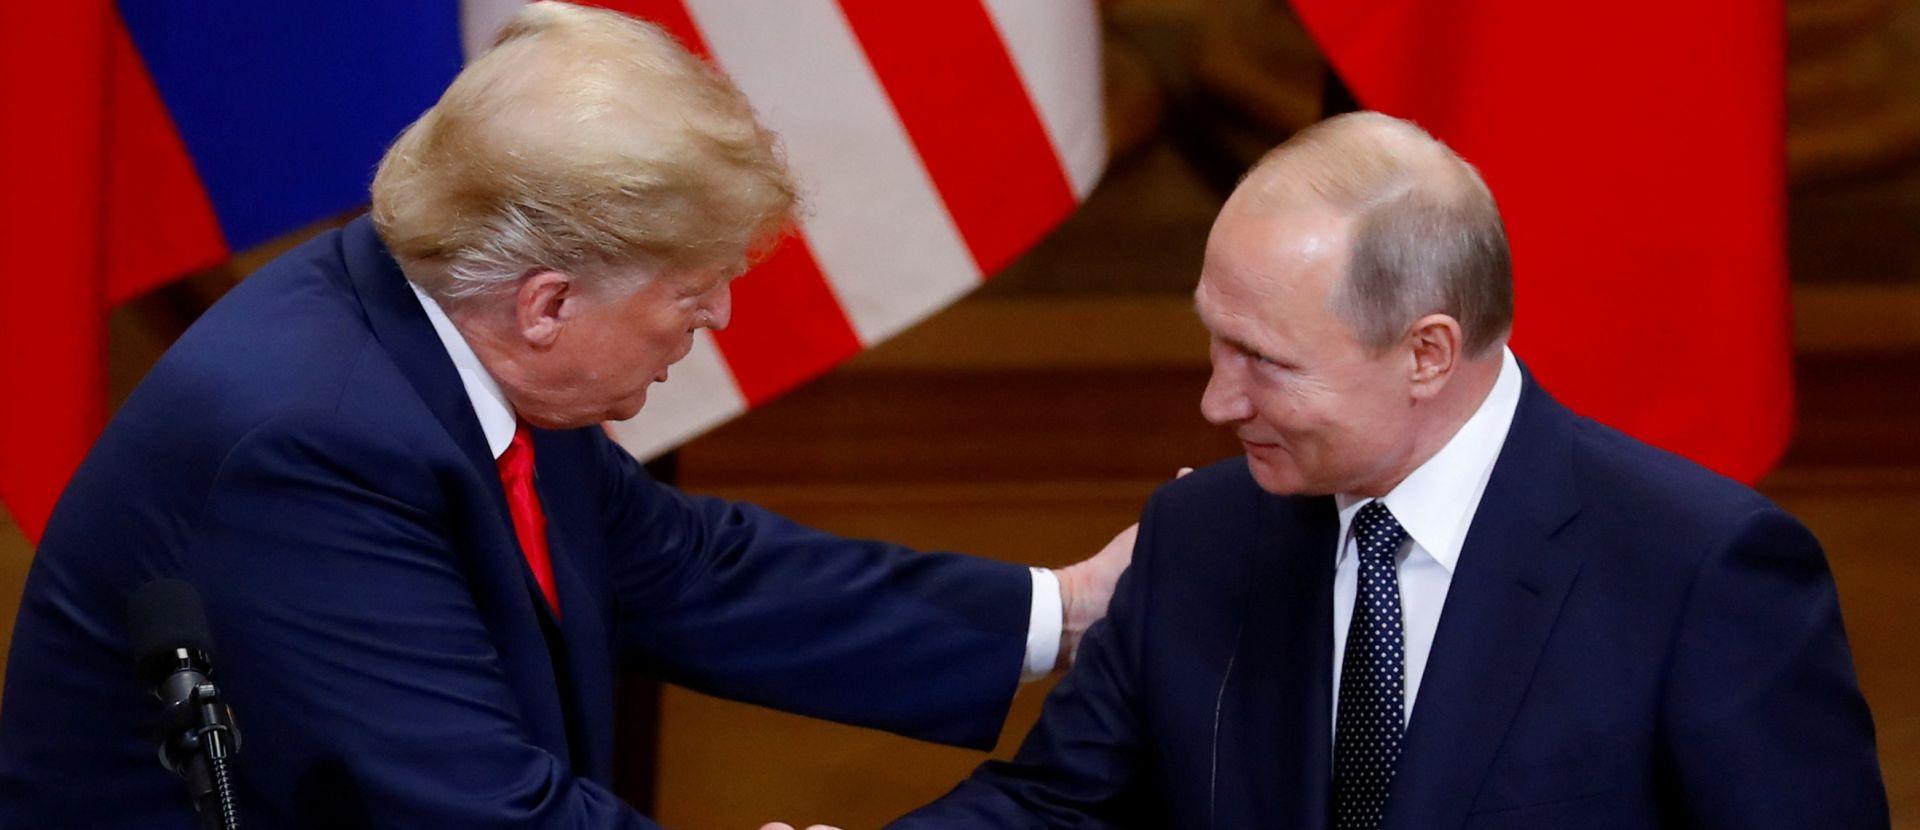 Susret Trumpa i Putina na G20 u Argentini